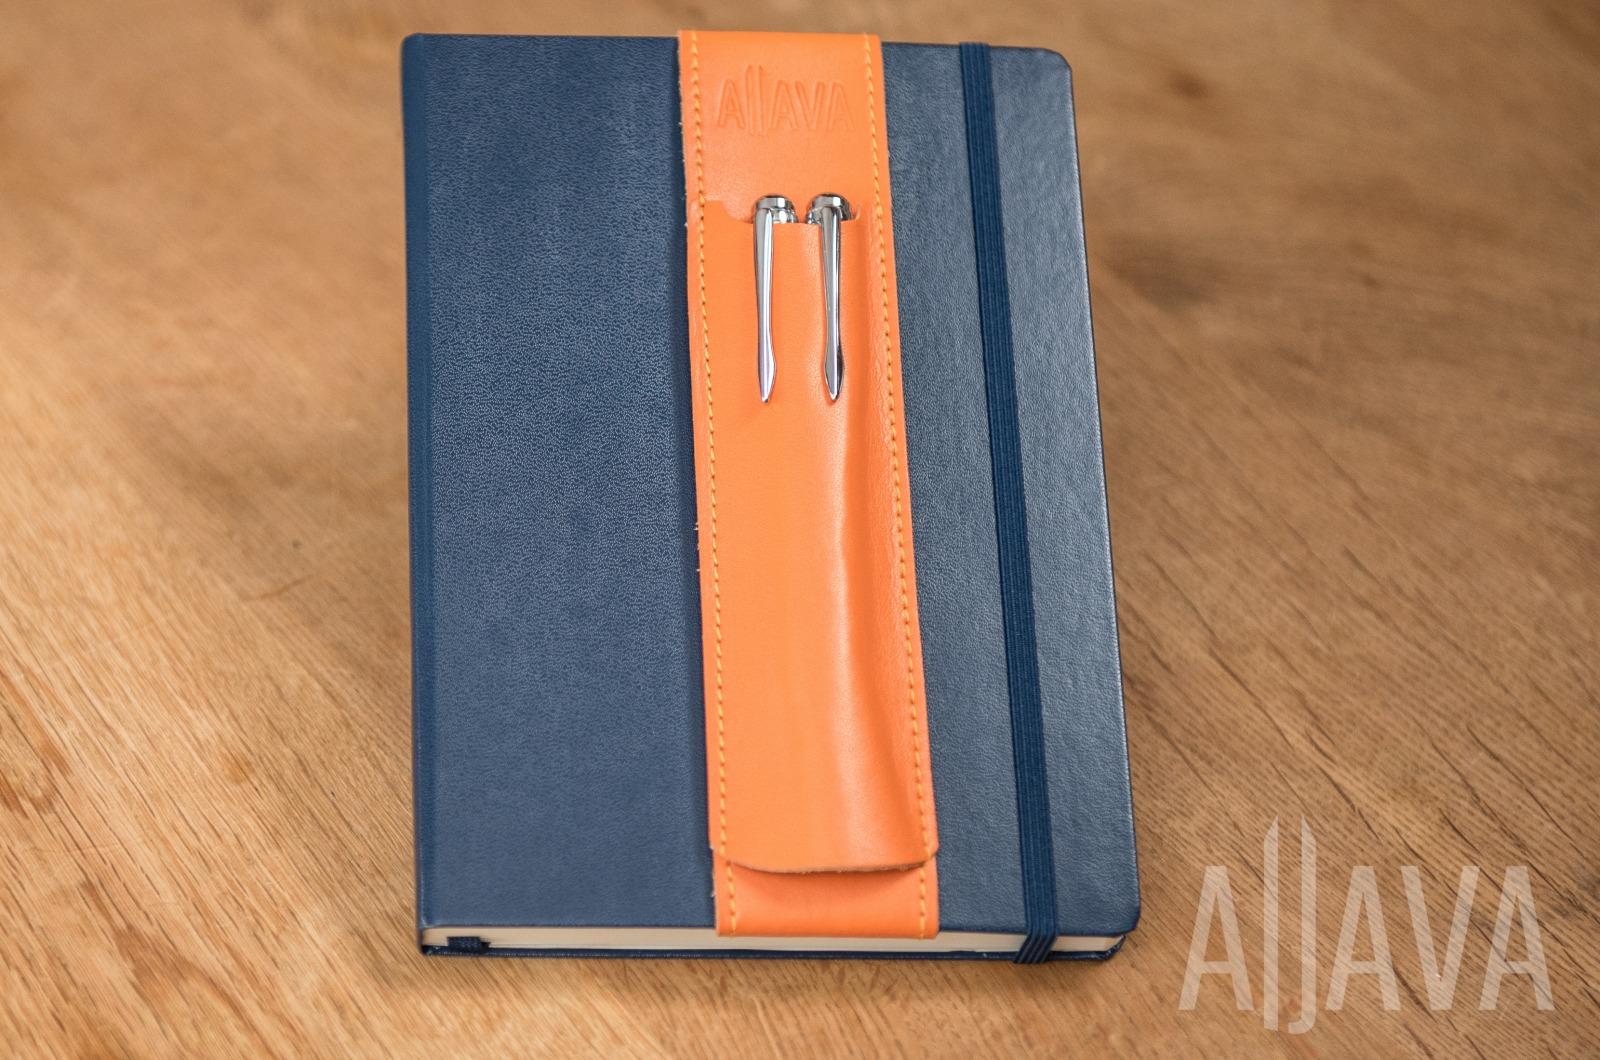 ALjAVA Louis Rindspaltleder: Orange Naht: Orange